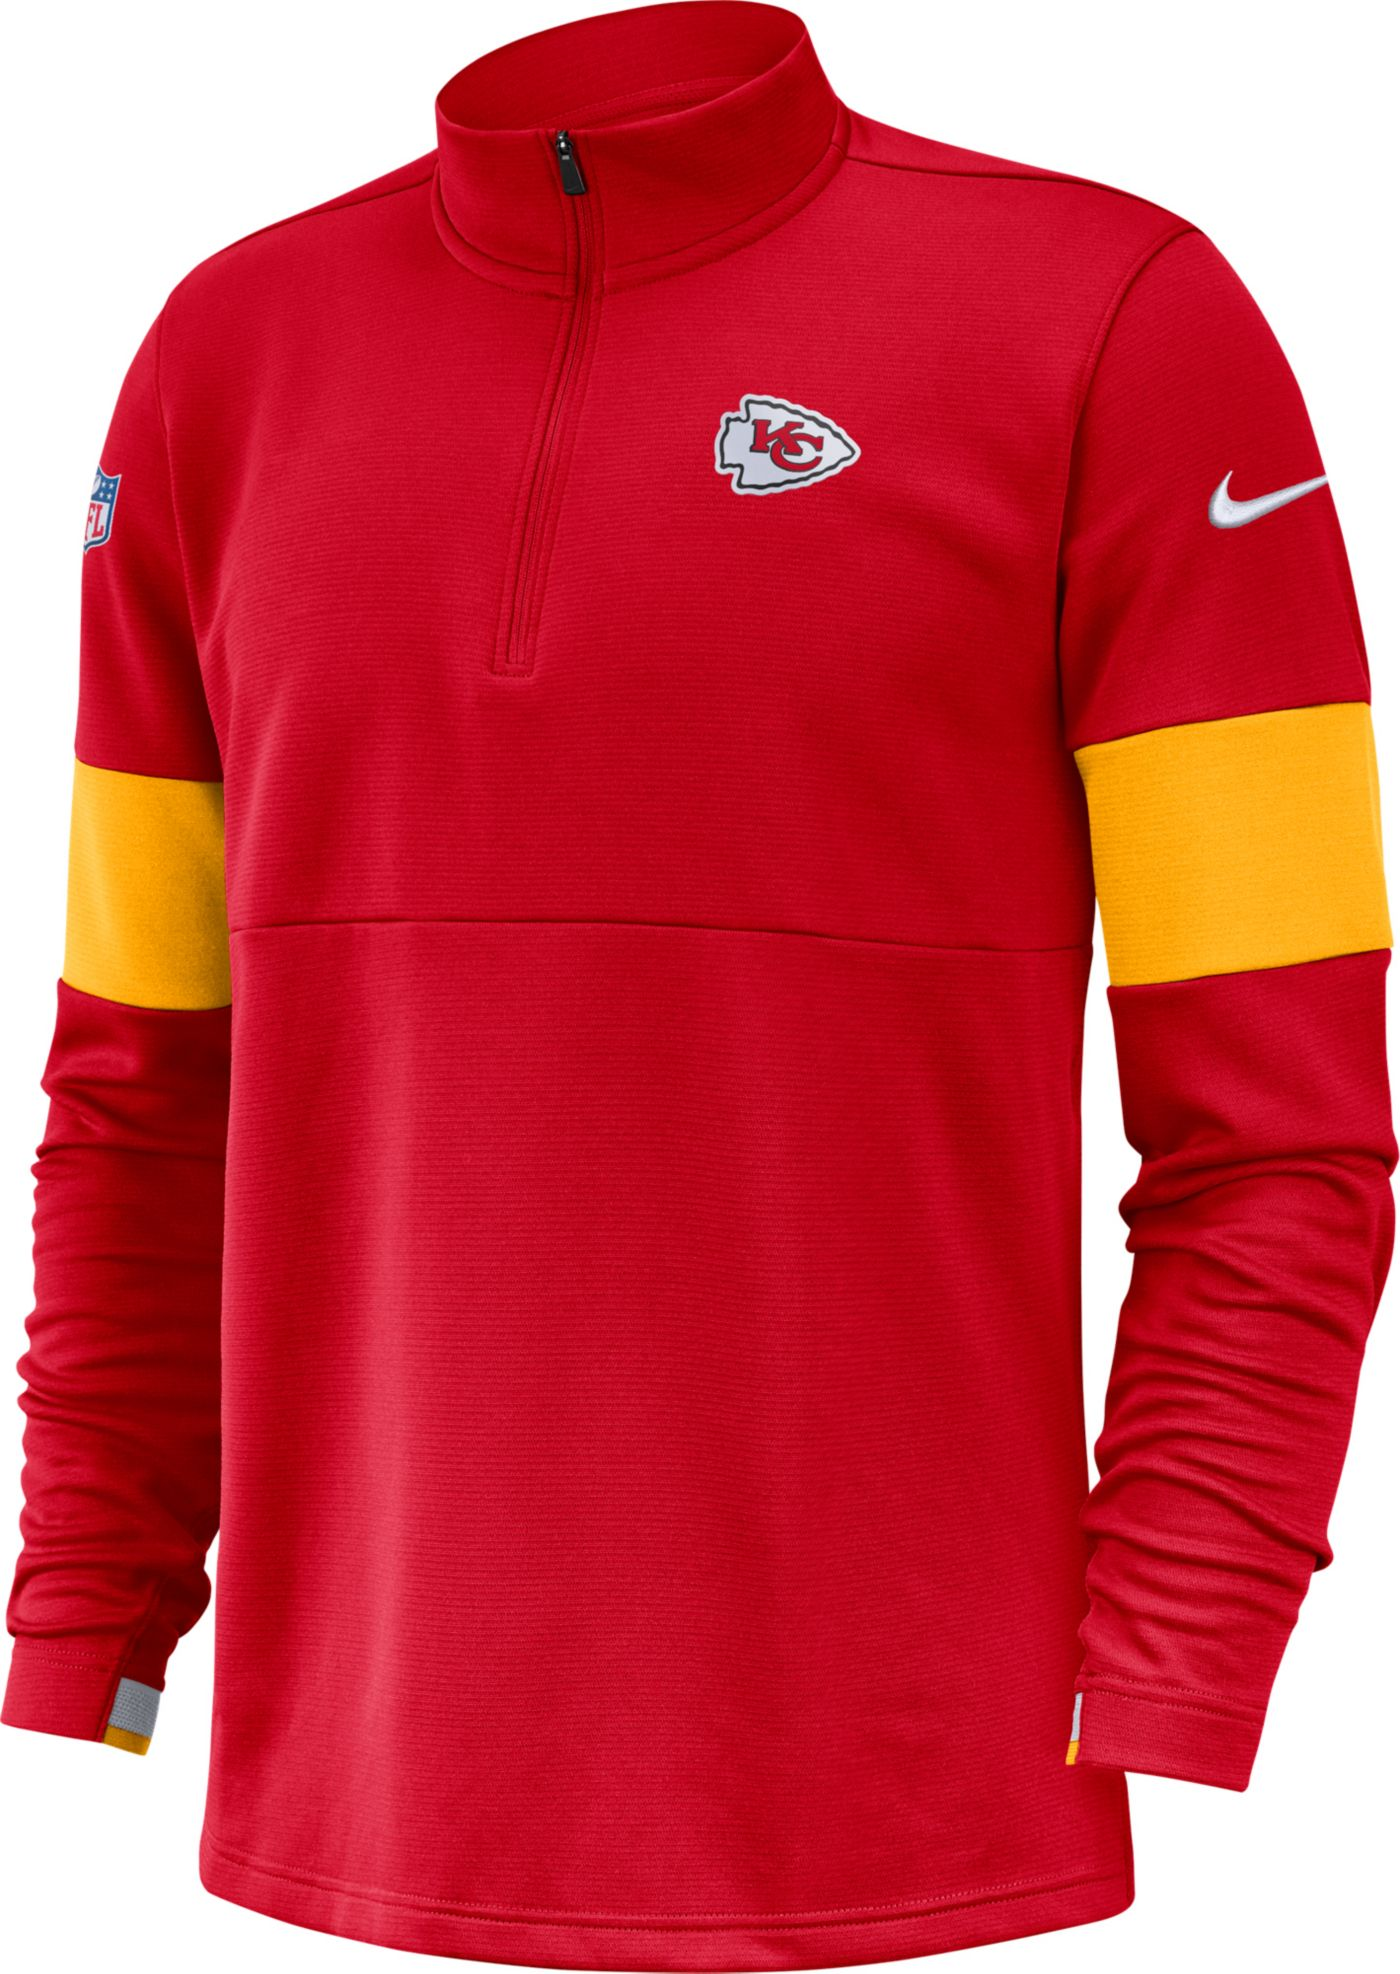 Nike Men's Kansas City Chiefs Sideline Coach Performance Red Half-Zip Pullover